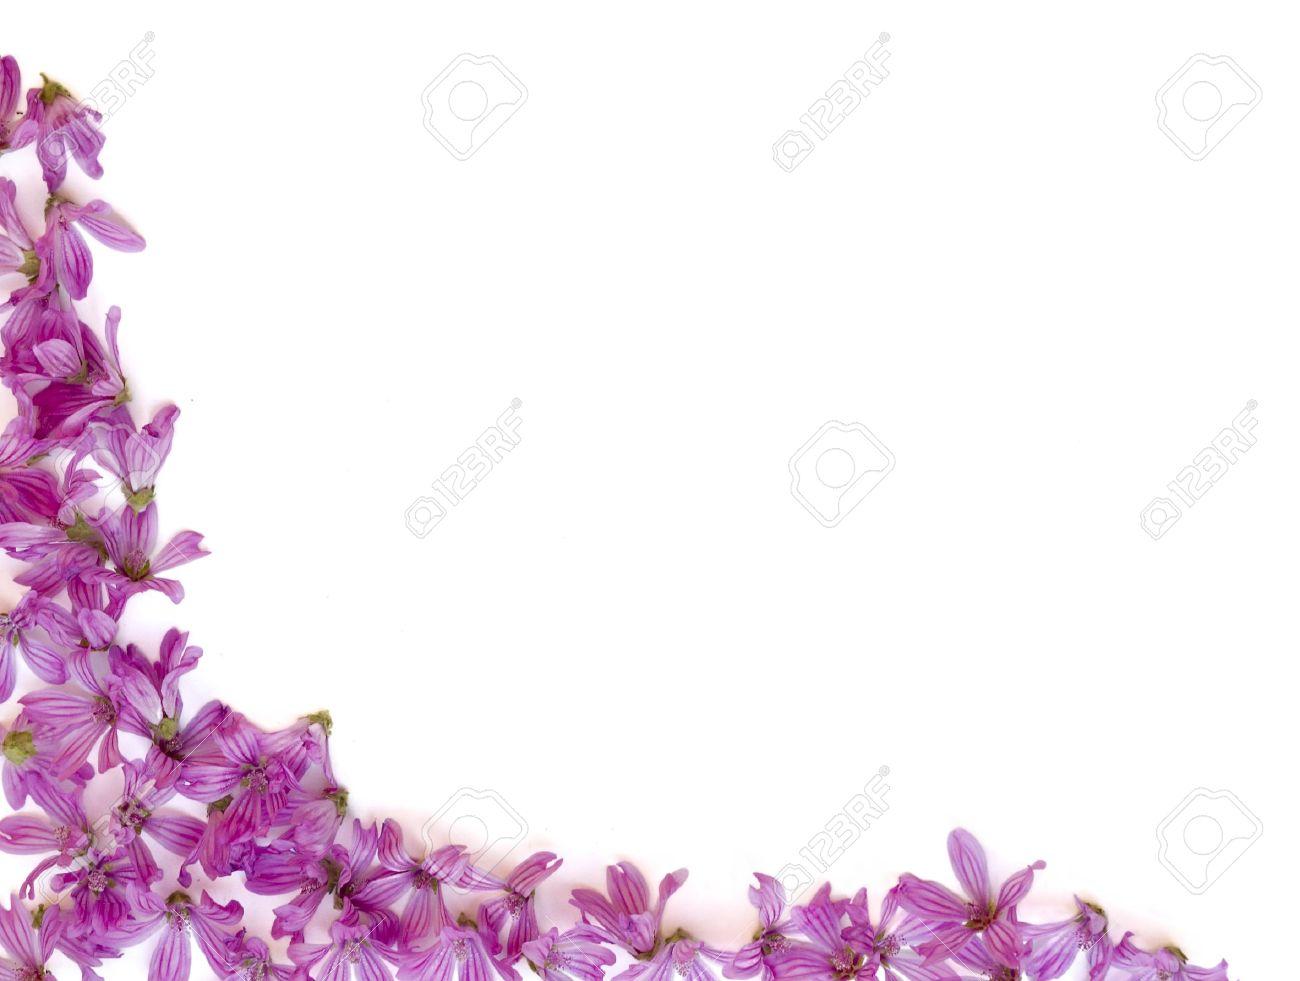 purple flowers backgrounds